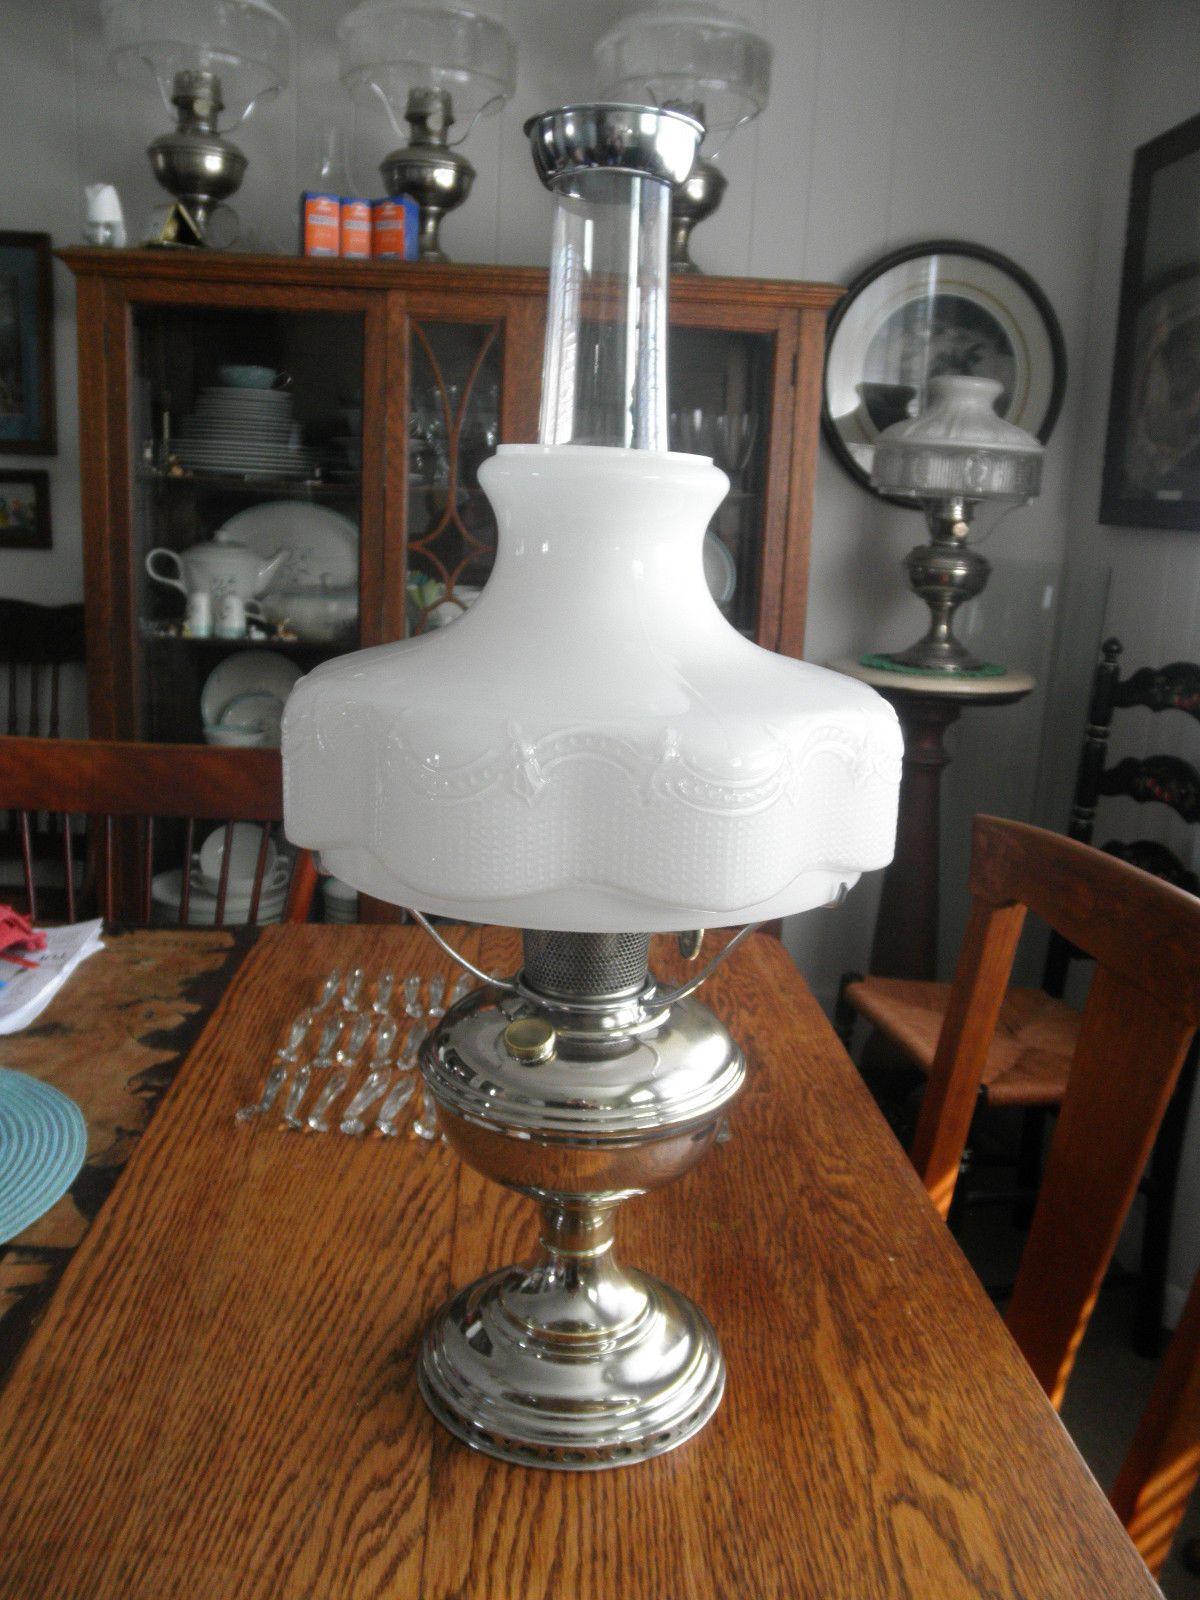 Aladdin oil lamp model 11 complete incl 201 shade screen chimney aladdin oil lamp model 11 complete incl 201 shade screen chimney mantle aloadofball Image collections